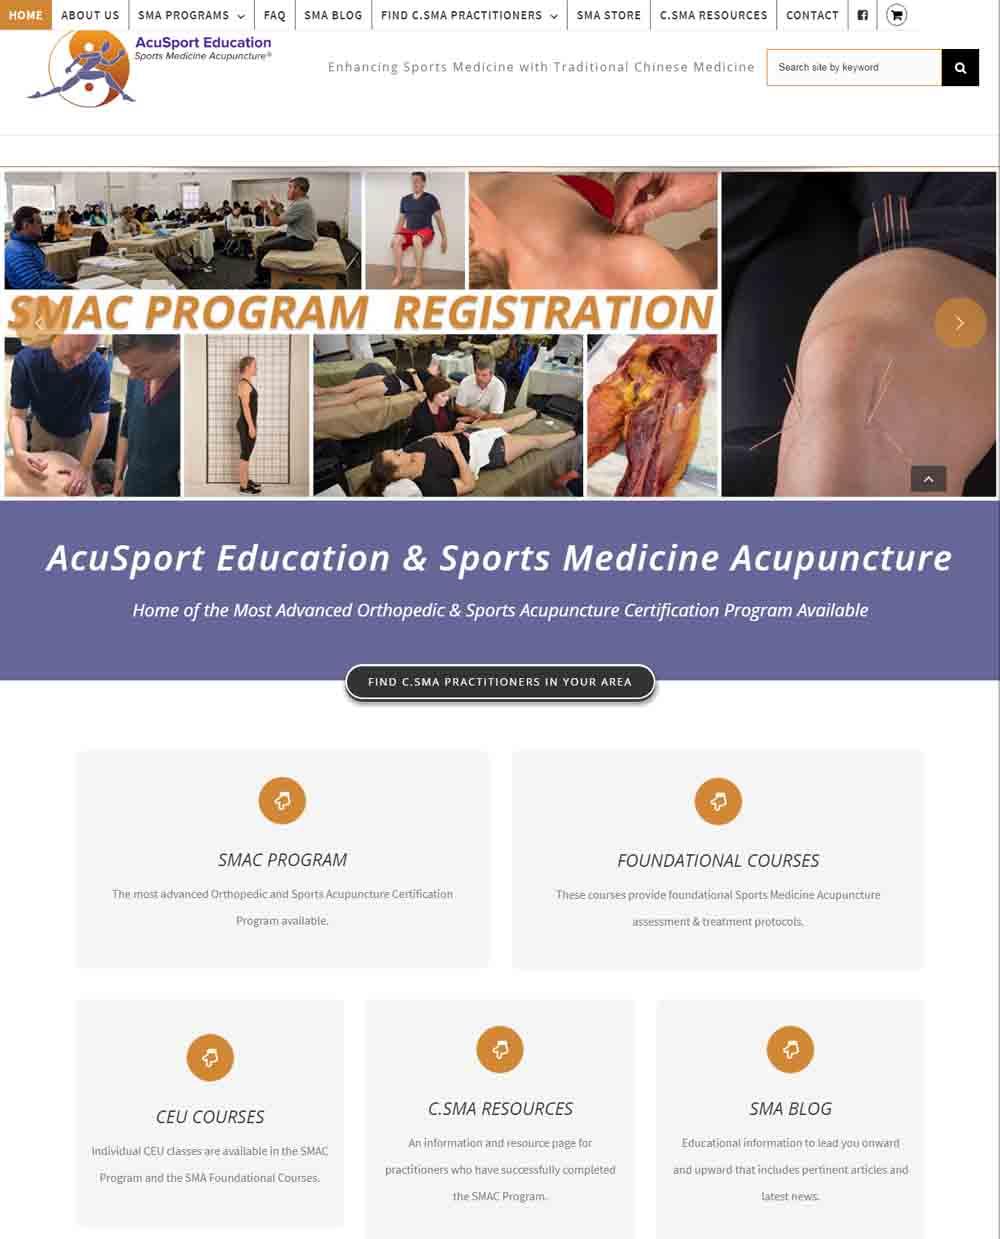 Acupuncture Website Design by Scribaceous.com